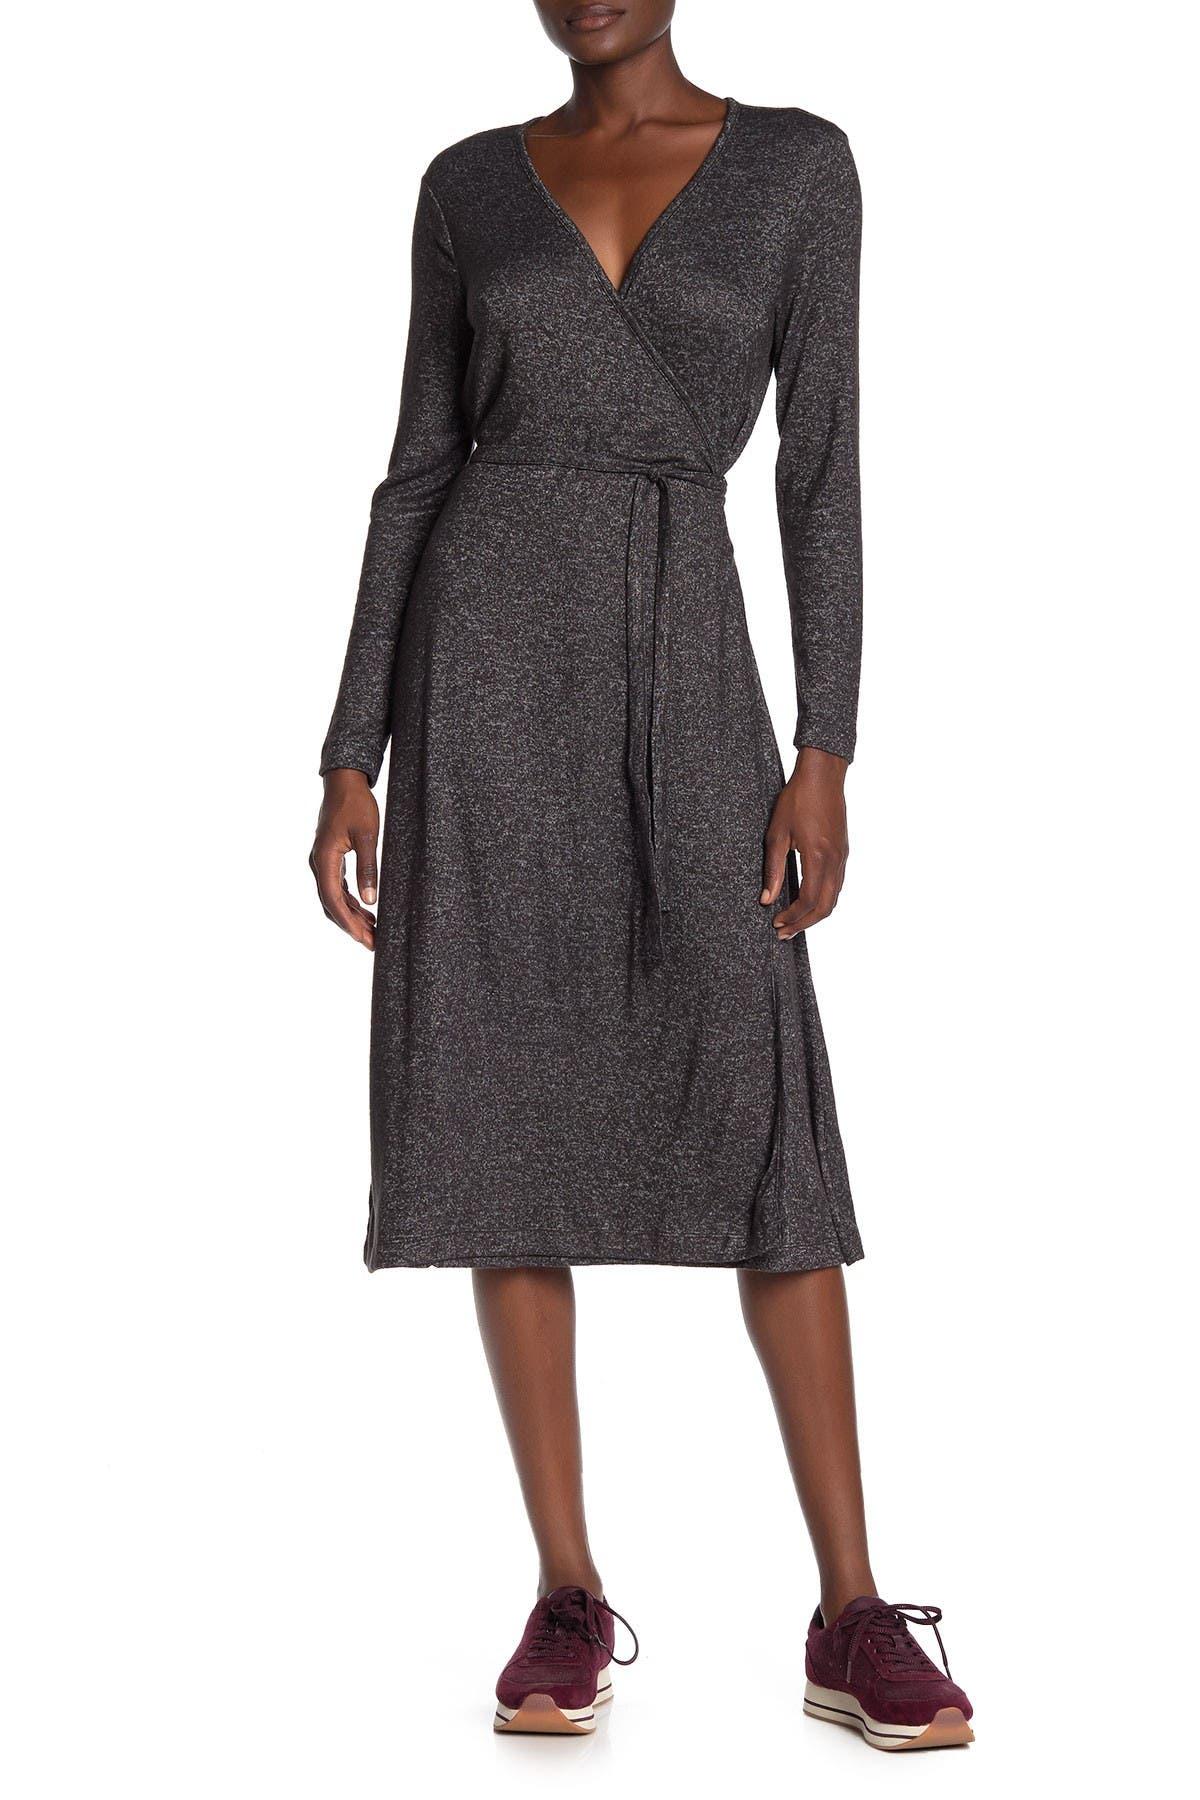 Image of SUSINA Faux Wrap Cozy Knit Dress